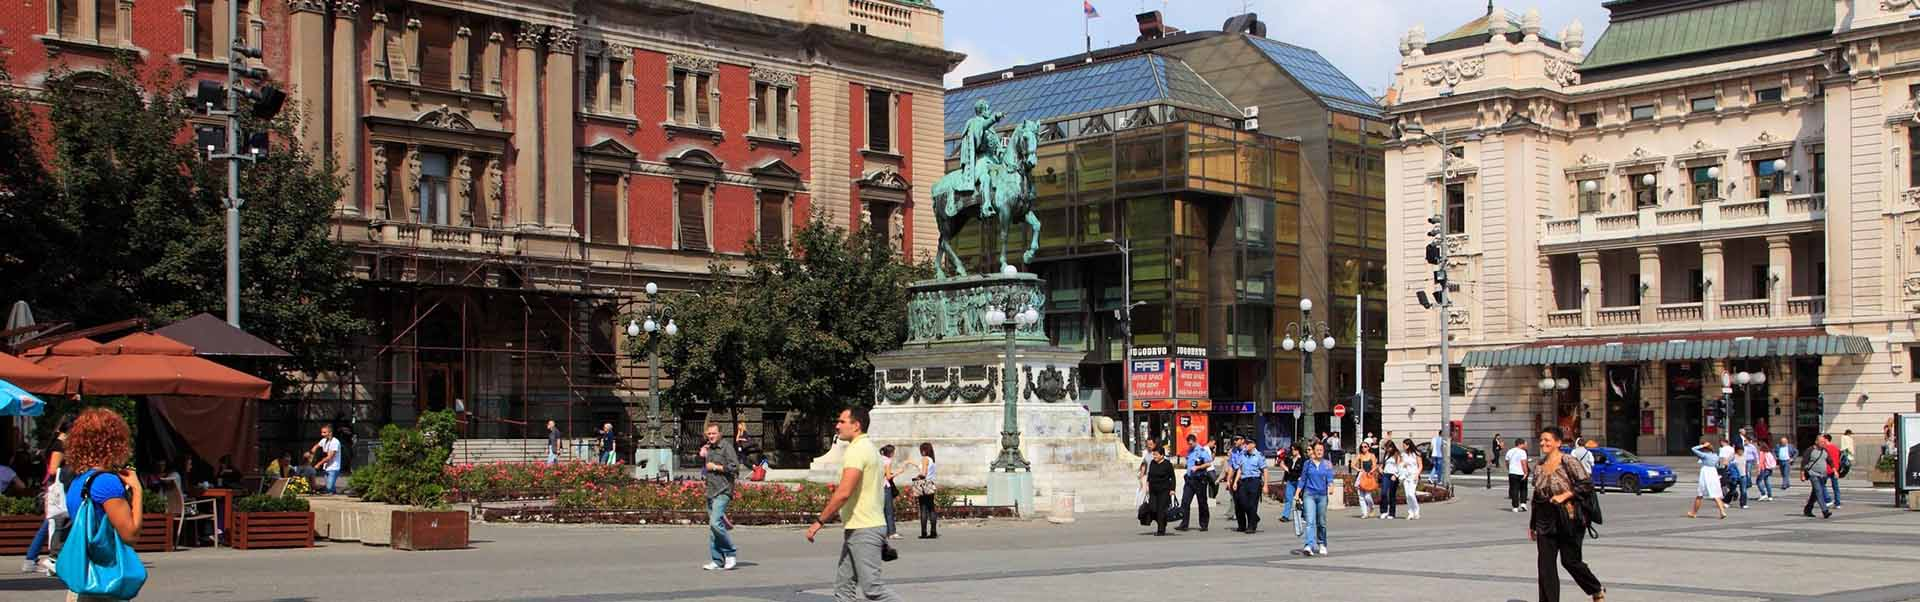 Dostava hrane Trg Republike | Beograd